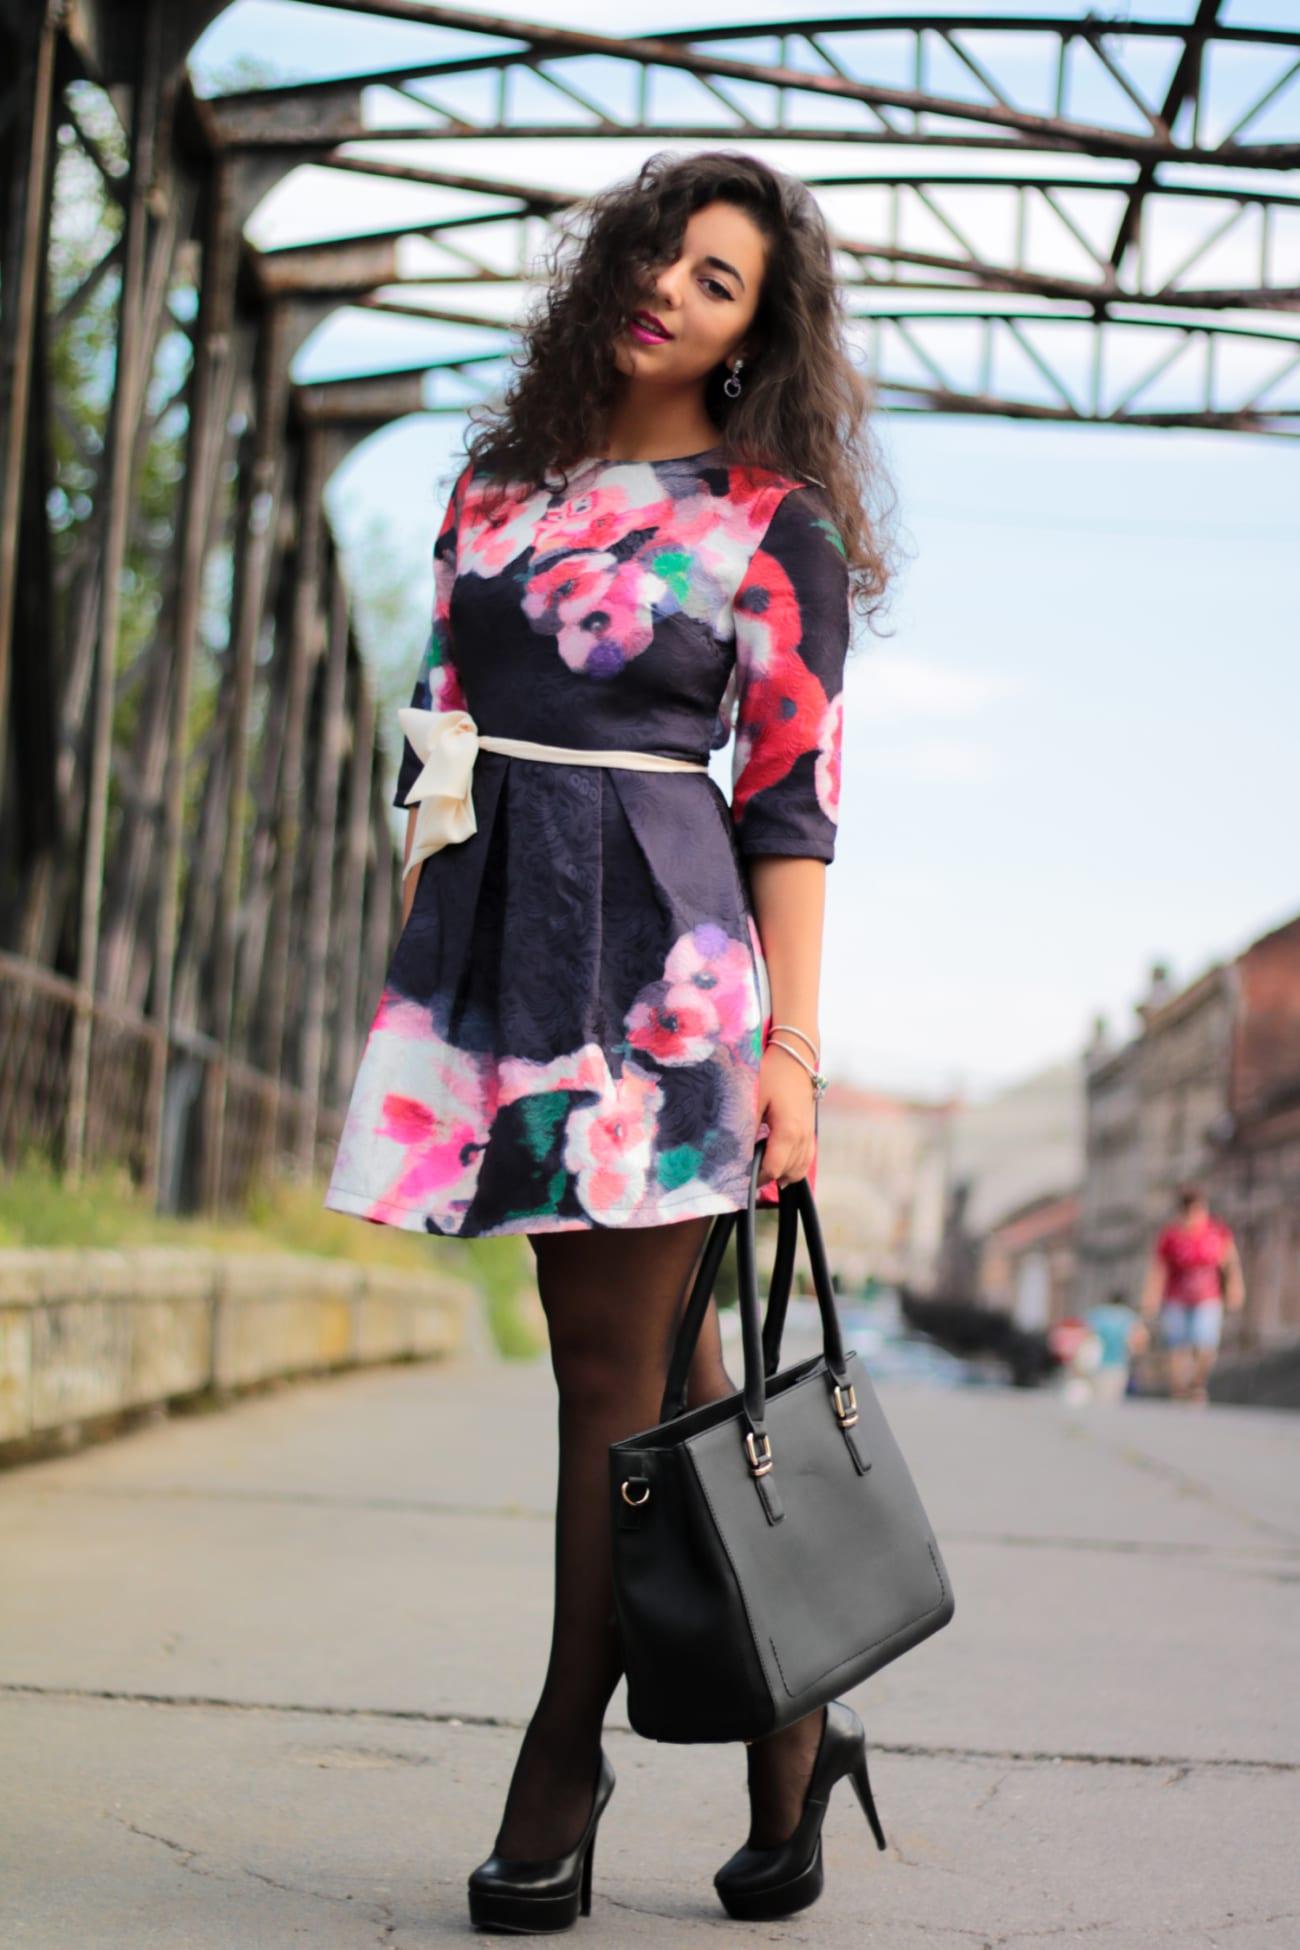 top-fashion-pareri-roxi-rose-timisoara-fashion-blogger-rochia-cu-flori-floral-dress-review-favorite-fashion-item-and-why-clothing-piece-